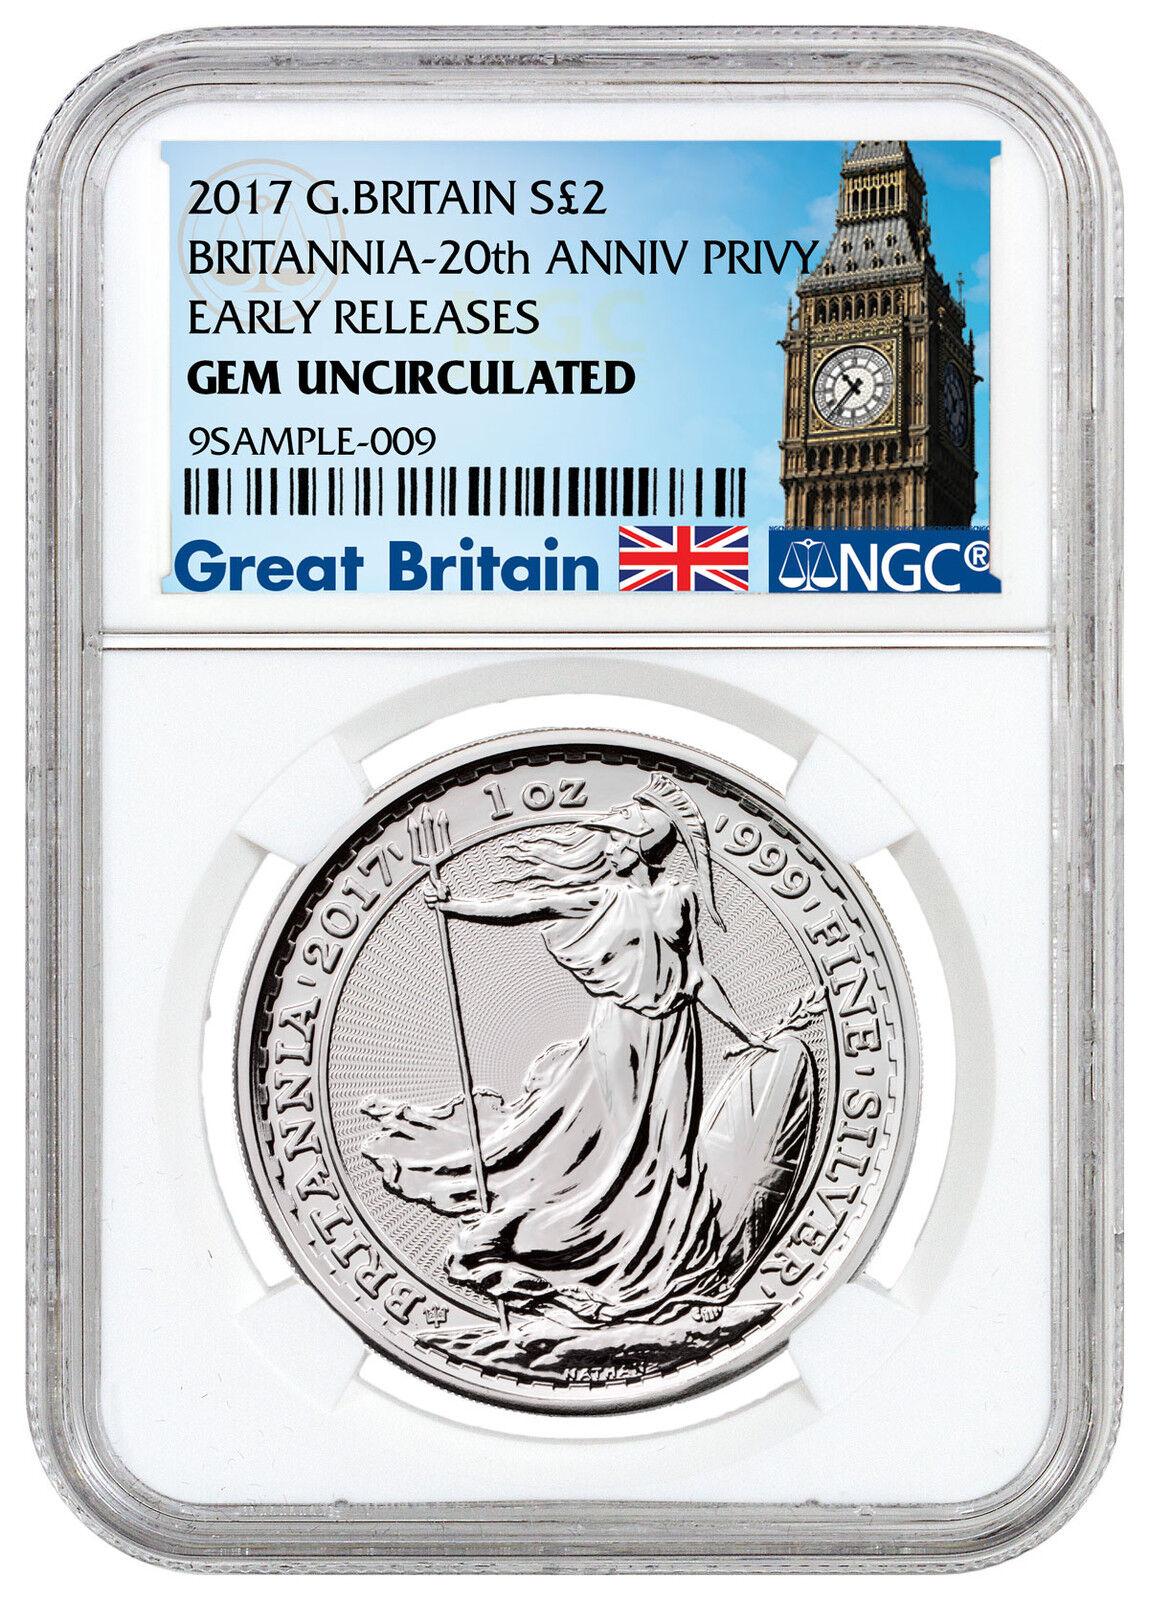 2017 Britain 1 Oz Silver Britannia 20th Trident Privy 163 2